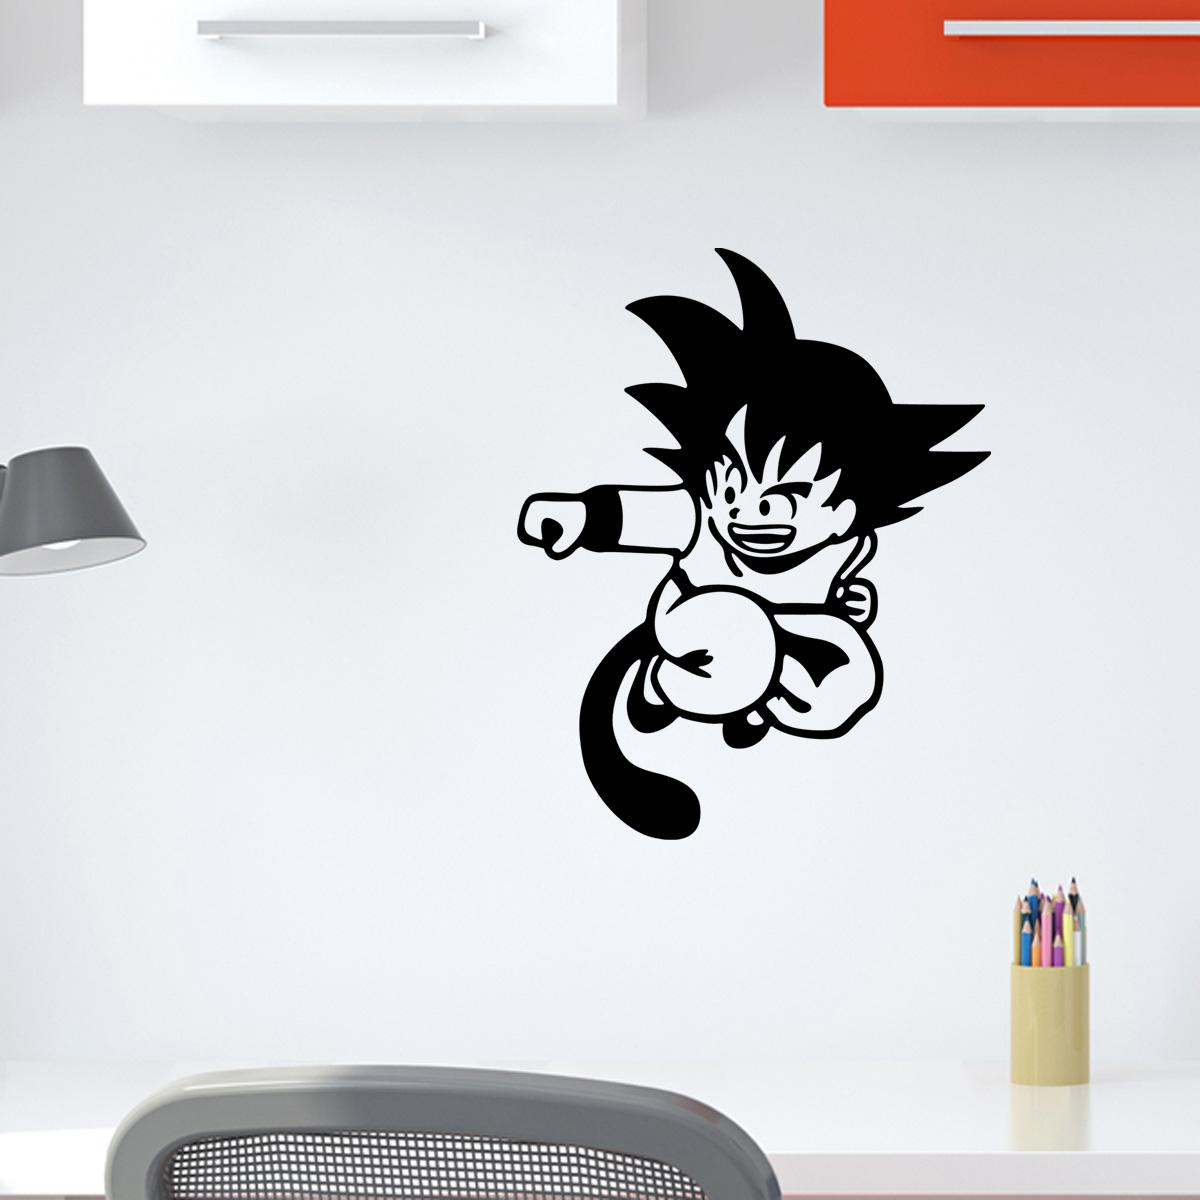 Stickers muraux pour les enfants  Sticker Dragon Ball attaque  Ambiancestickercom